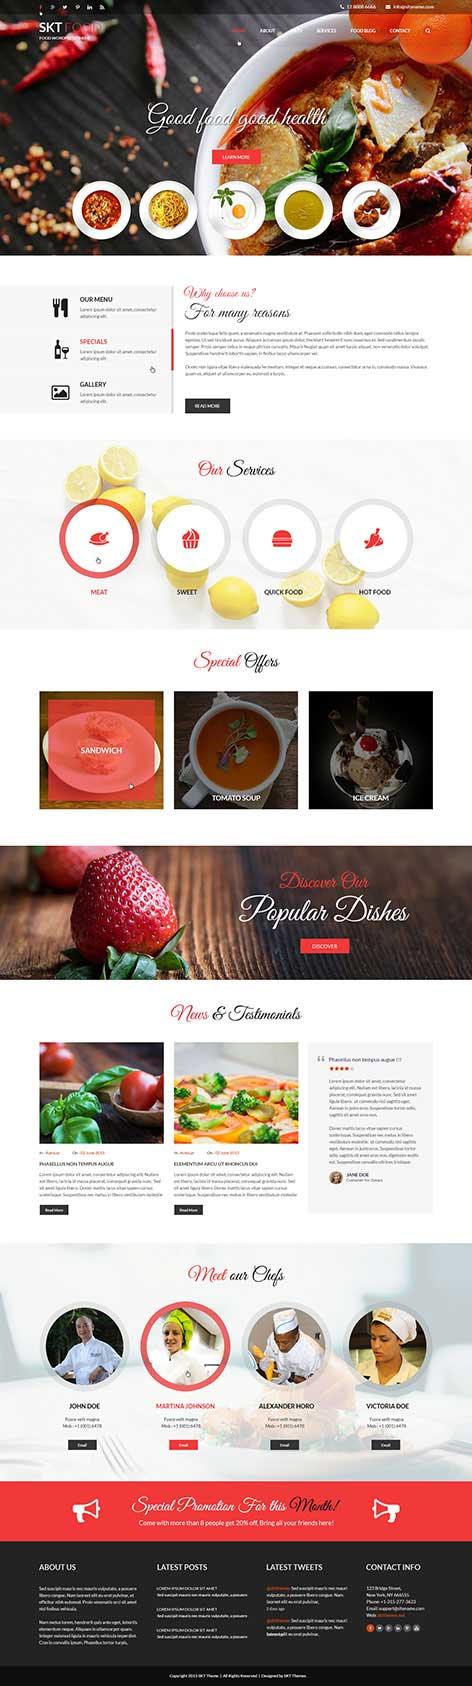 food and recipes WordPress theme